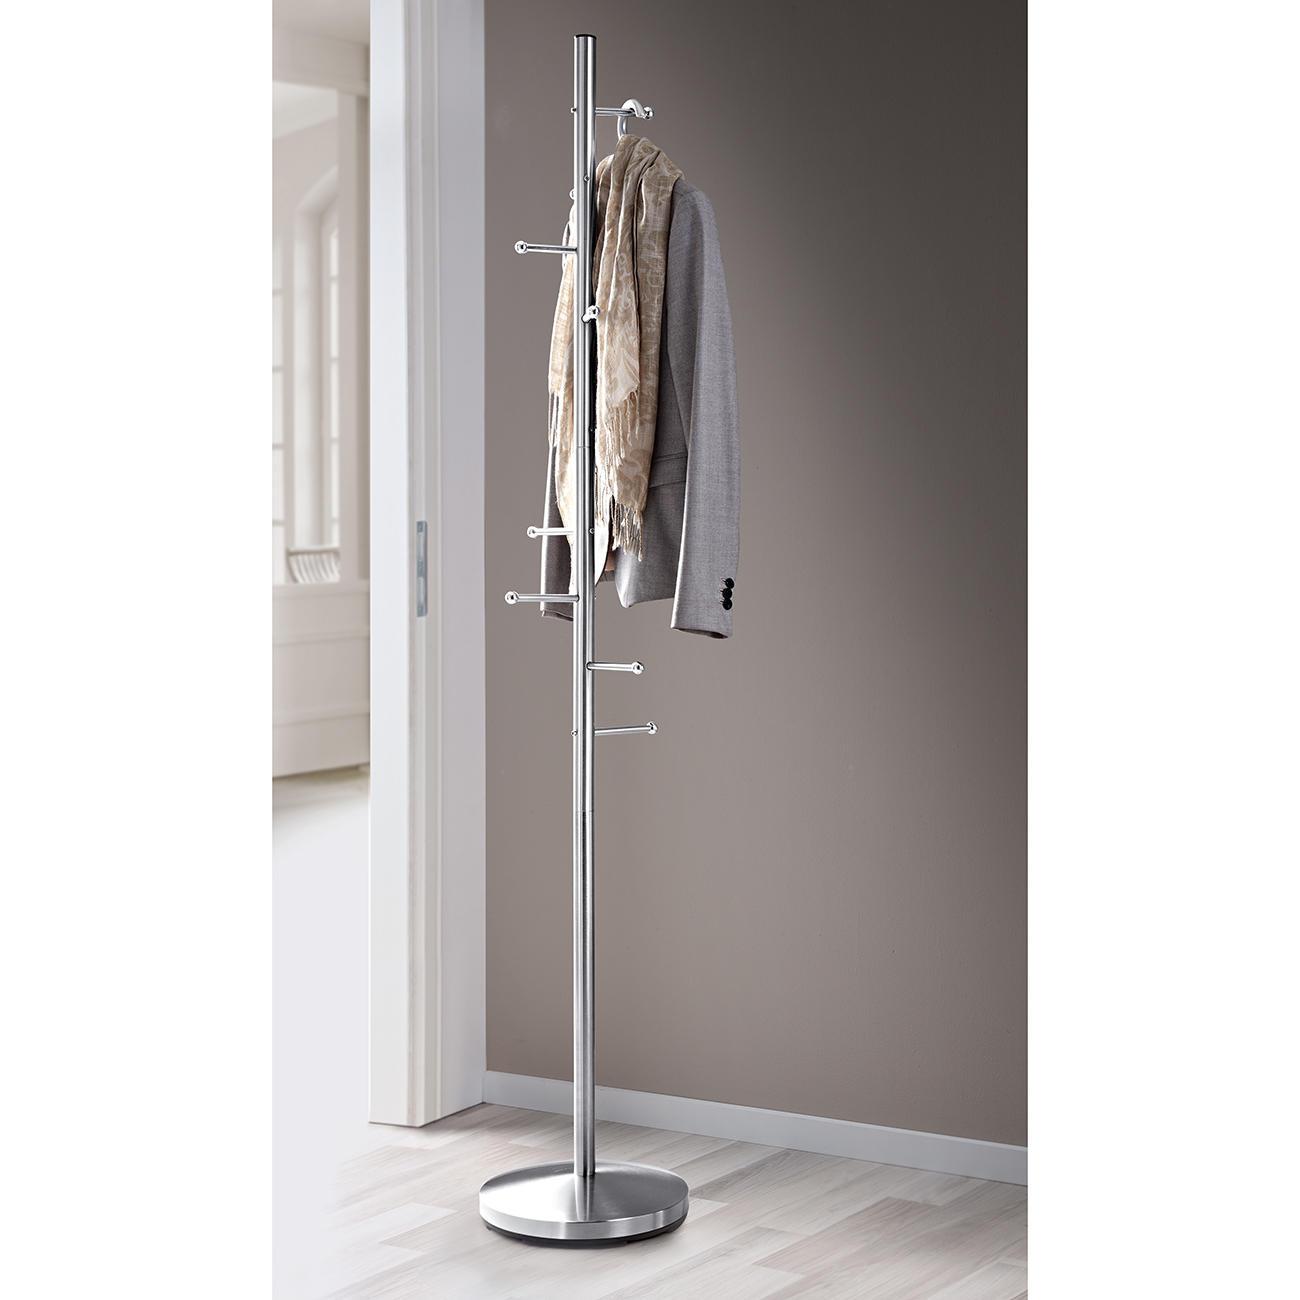 Garderobe 3 Jahre Garantie Pro Idee